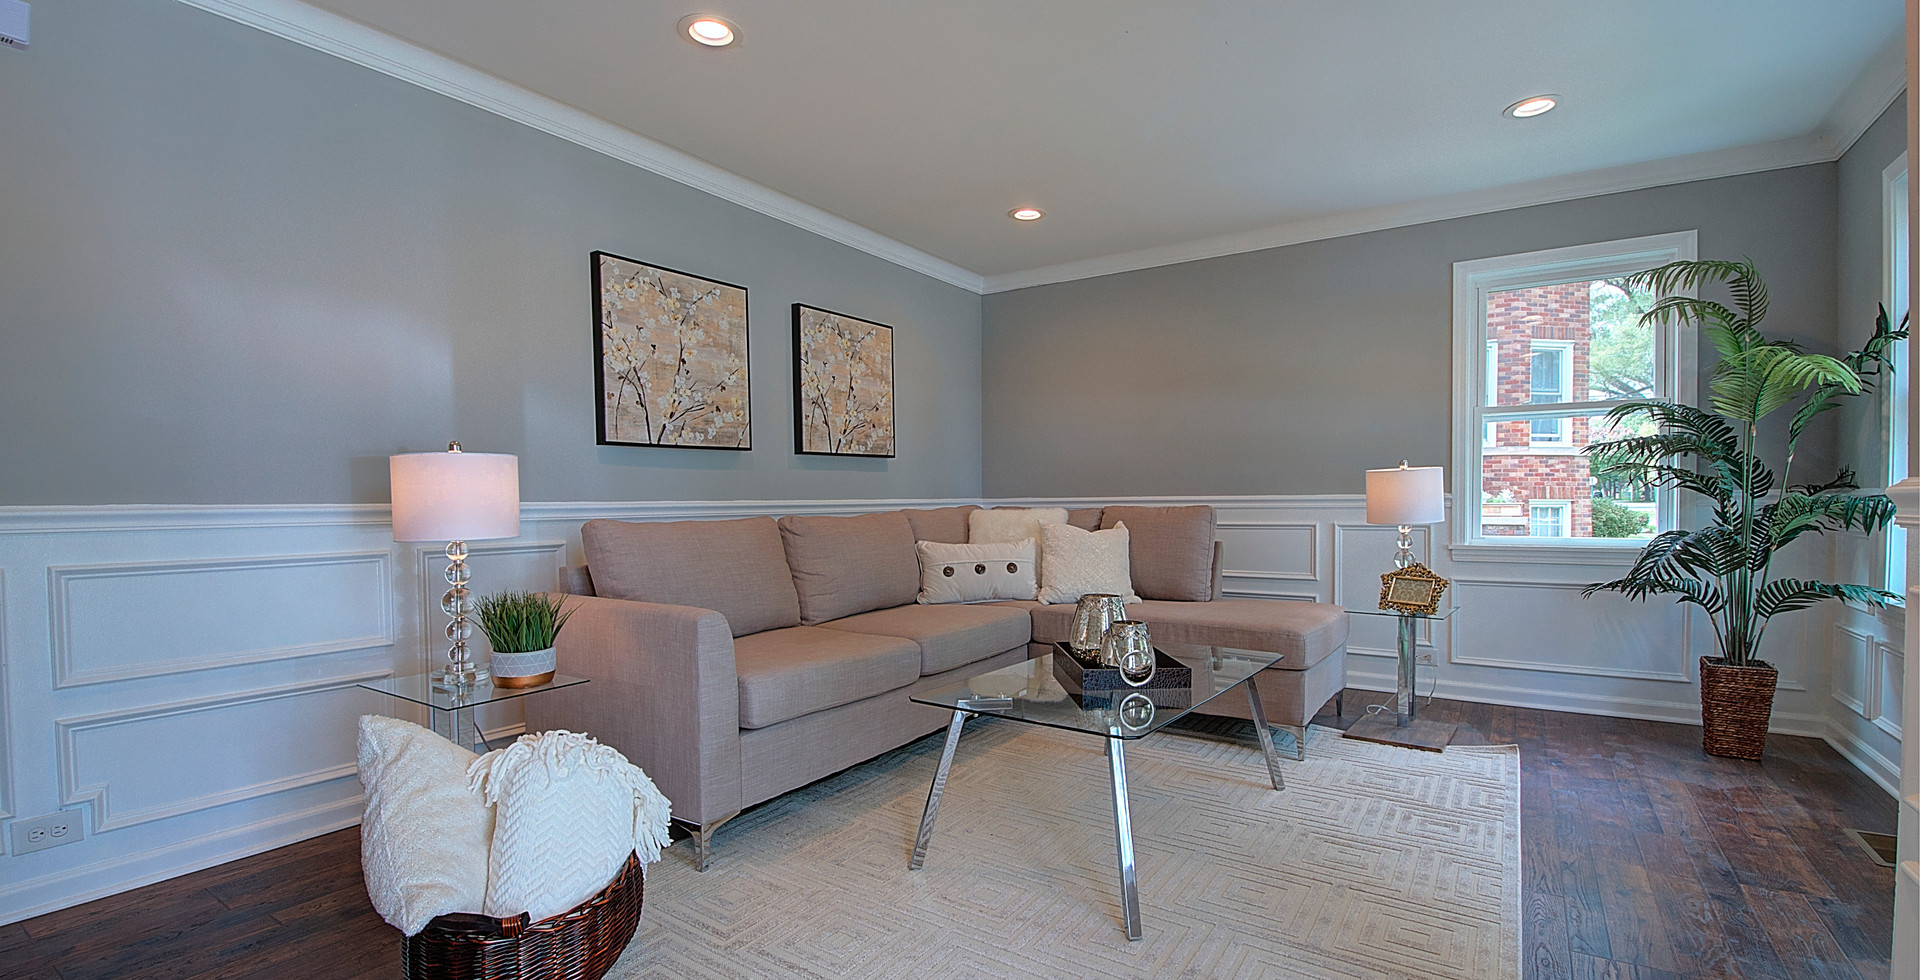 Living Room in Aurora designed by MRM Home Design.jpg